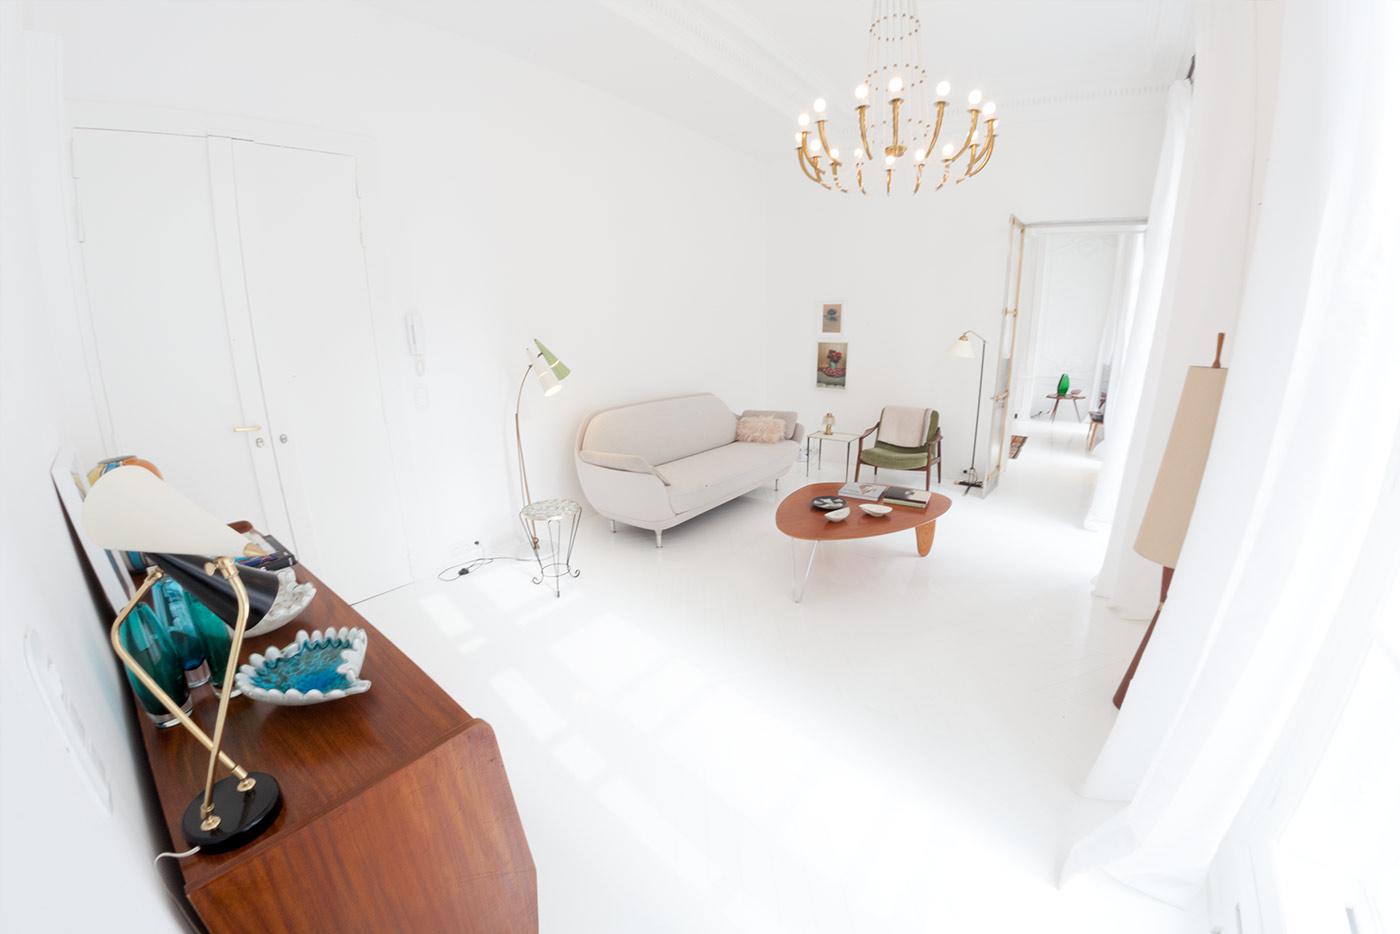 maison blanche r novation bear architectes agence architecture jeremy biermann. Black Bedroom Furniture Sets. Home Design Ideas